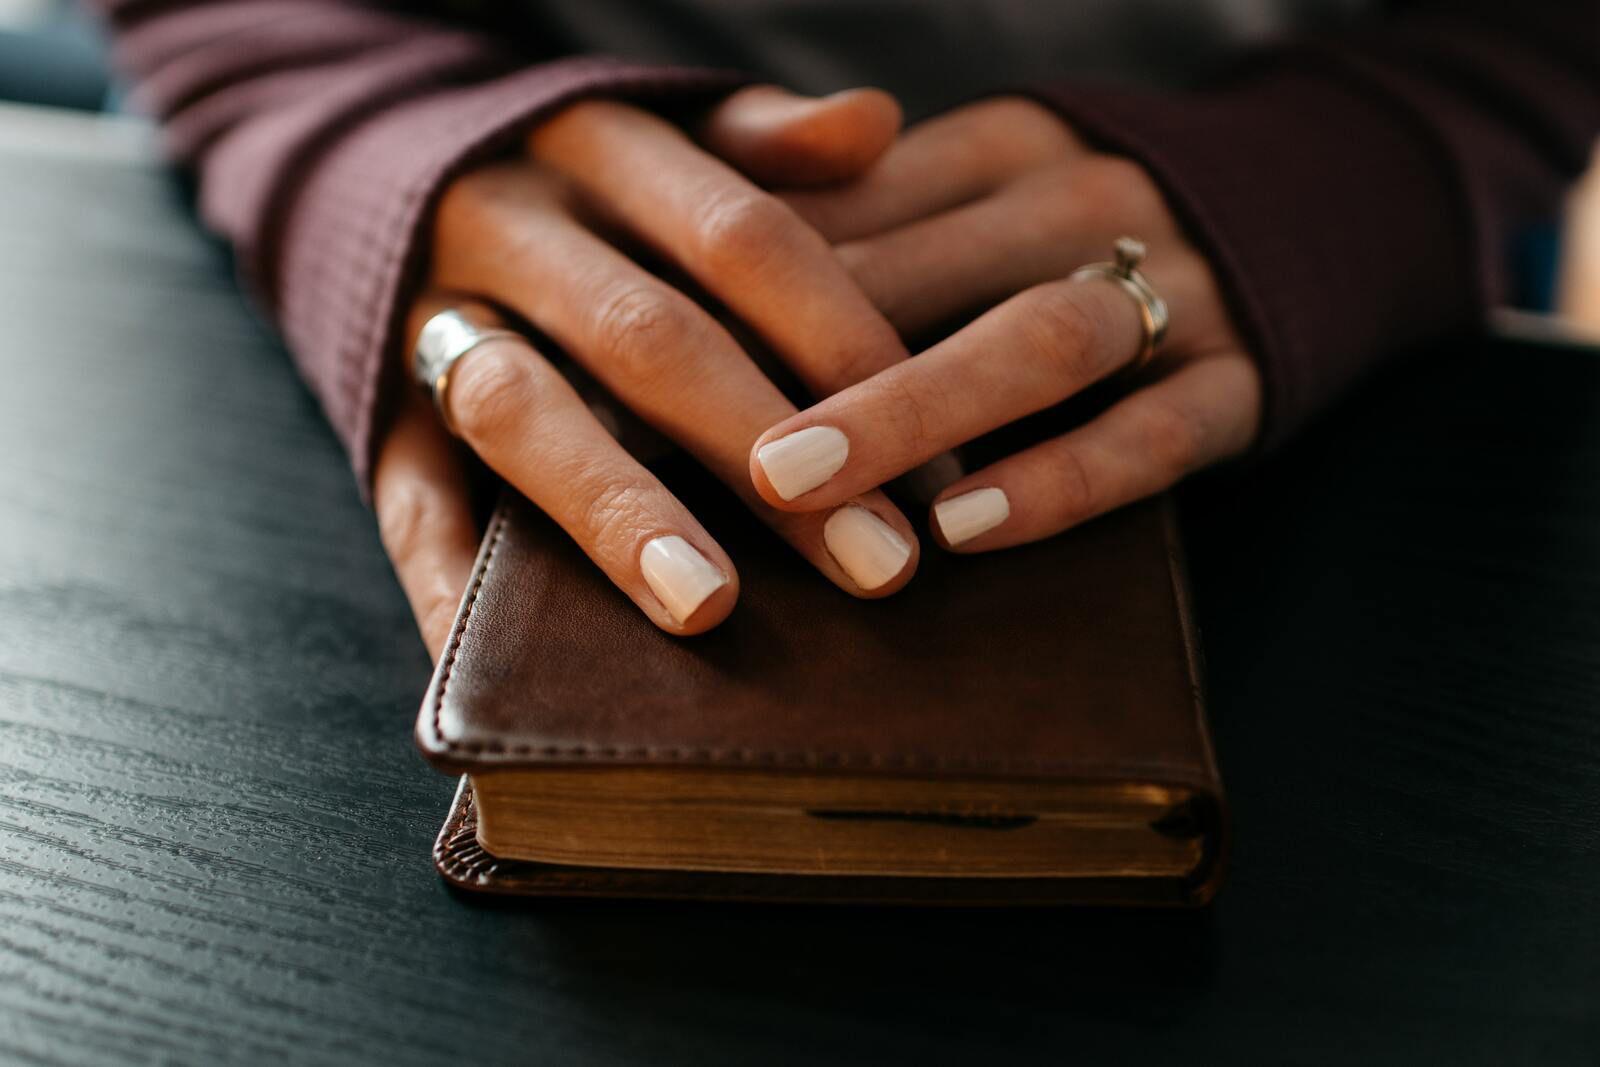 Psaumes 56.4 / JESUS DIEU SAINT-ESPRIT- HAND BIBLE-Photo by Kelly Sikkema on Unsplash